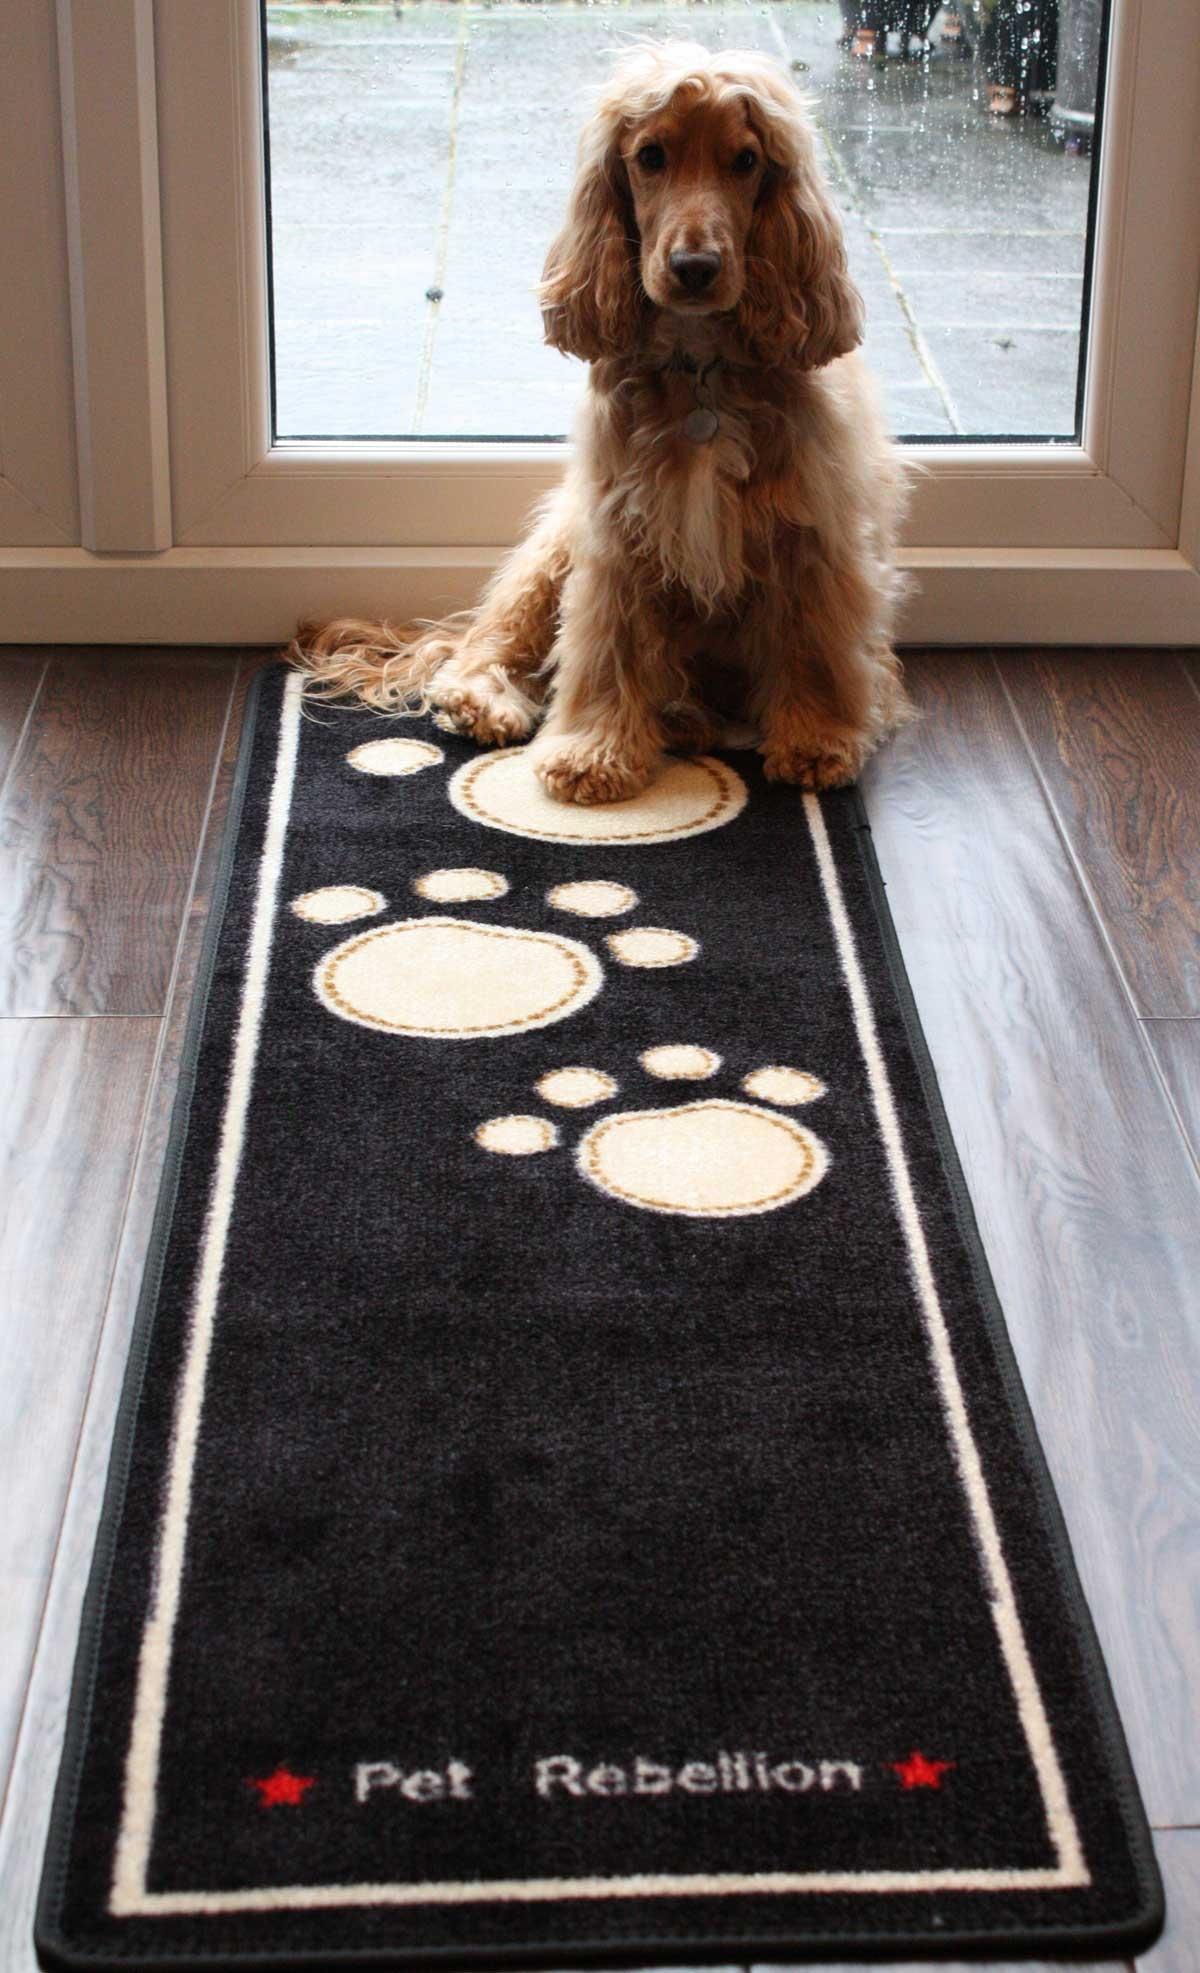 Pet Rebellion Runner Stylish Amp Fun Floor Mat Dog Cat